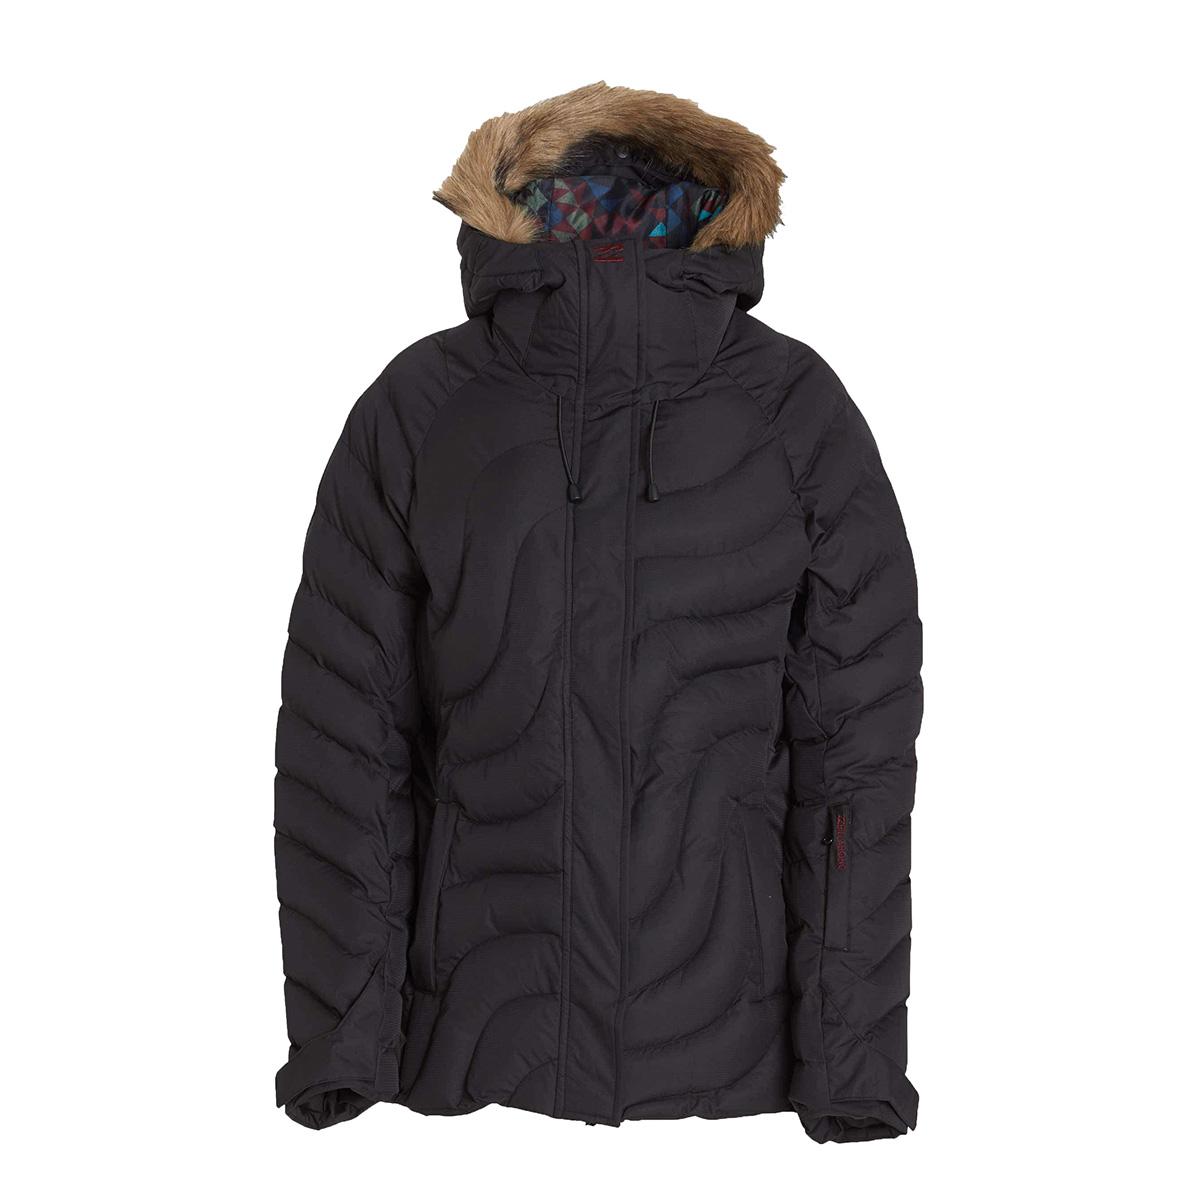 Billabong Snowboard kabát SOFFYA F6JF06 - 19 BLACK 33457e8c80